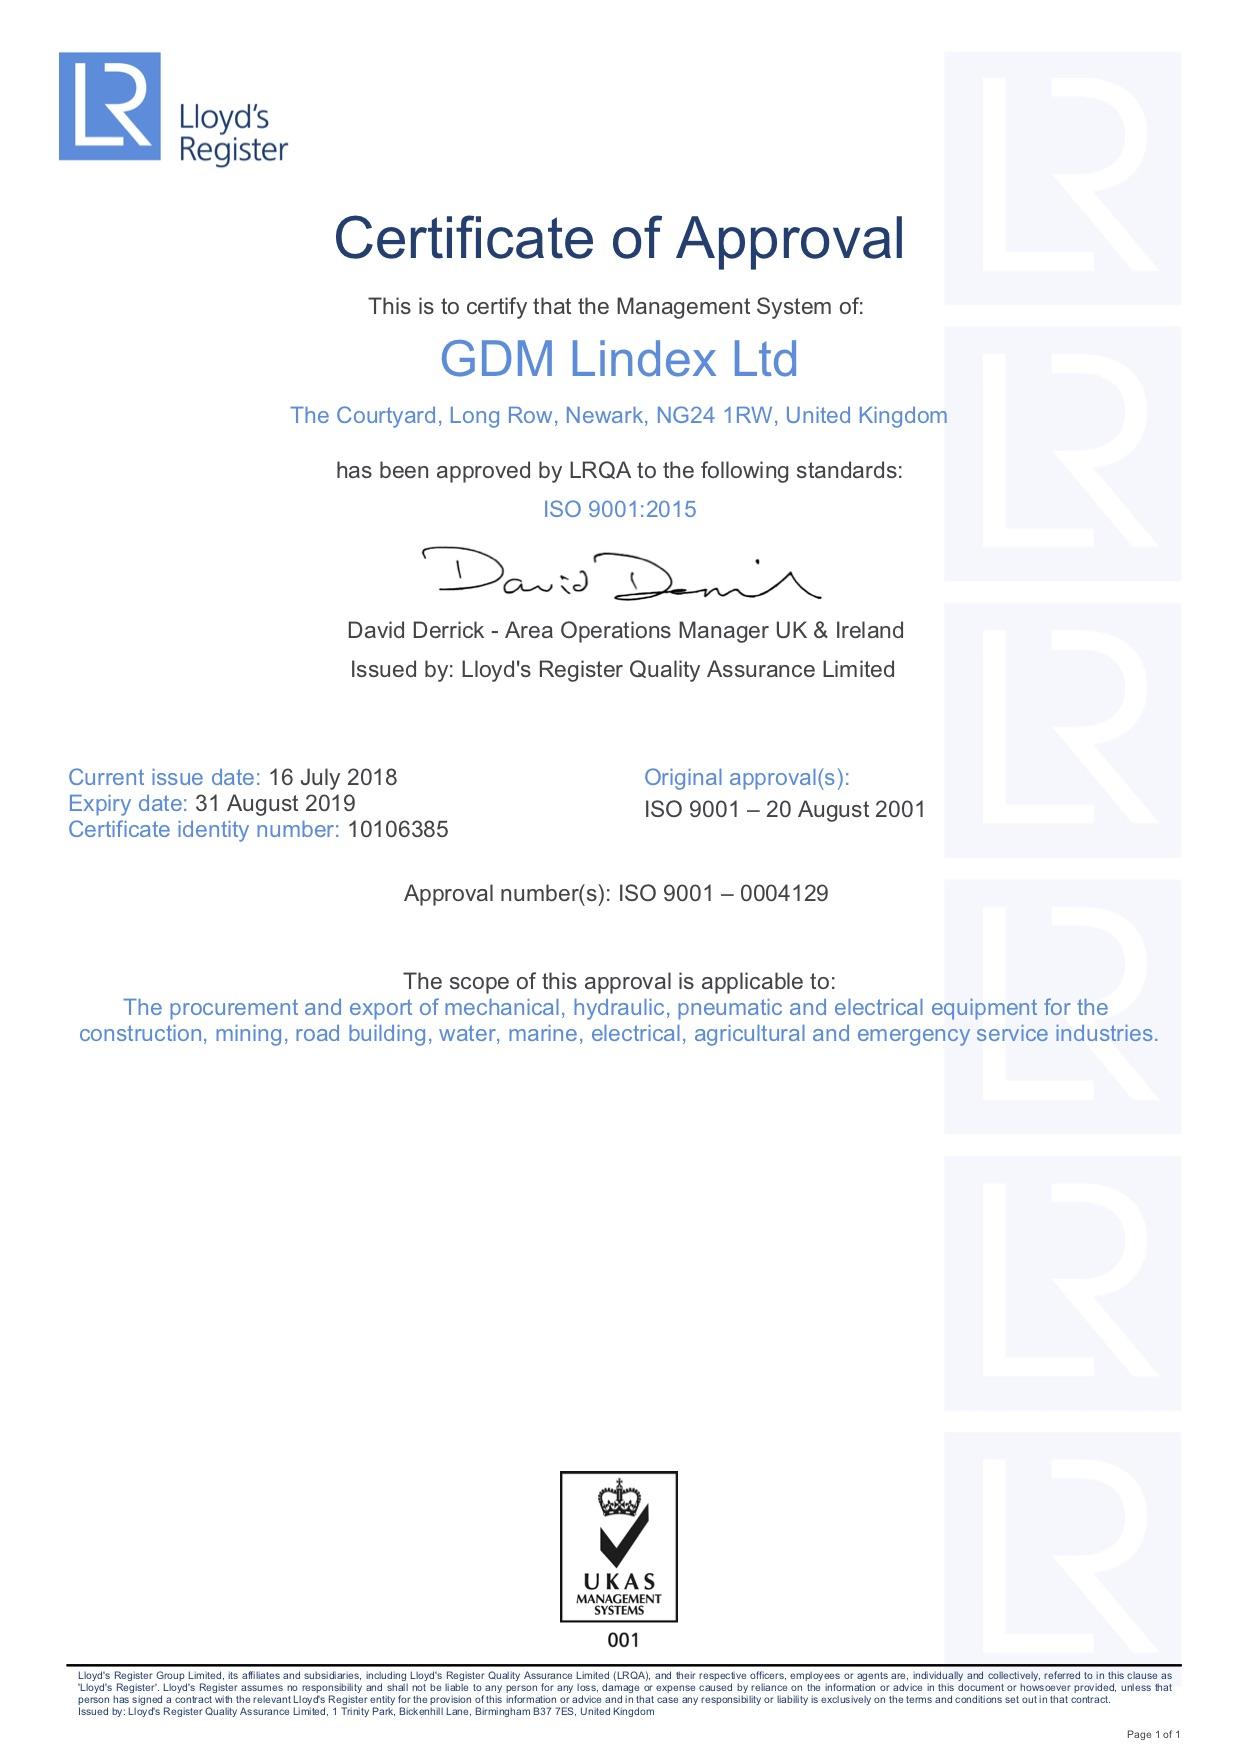 Management Approval Certificate - GDM Lindex